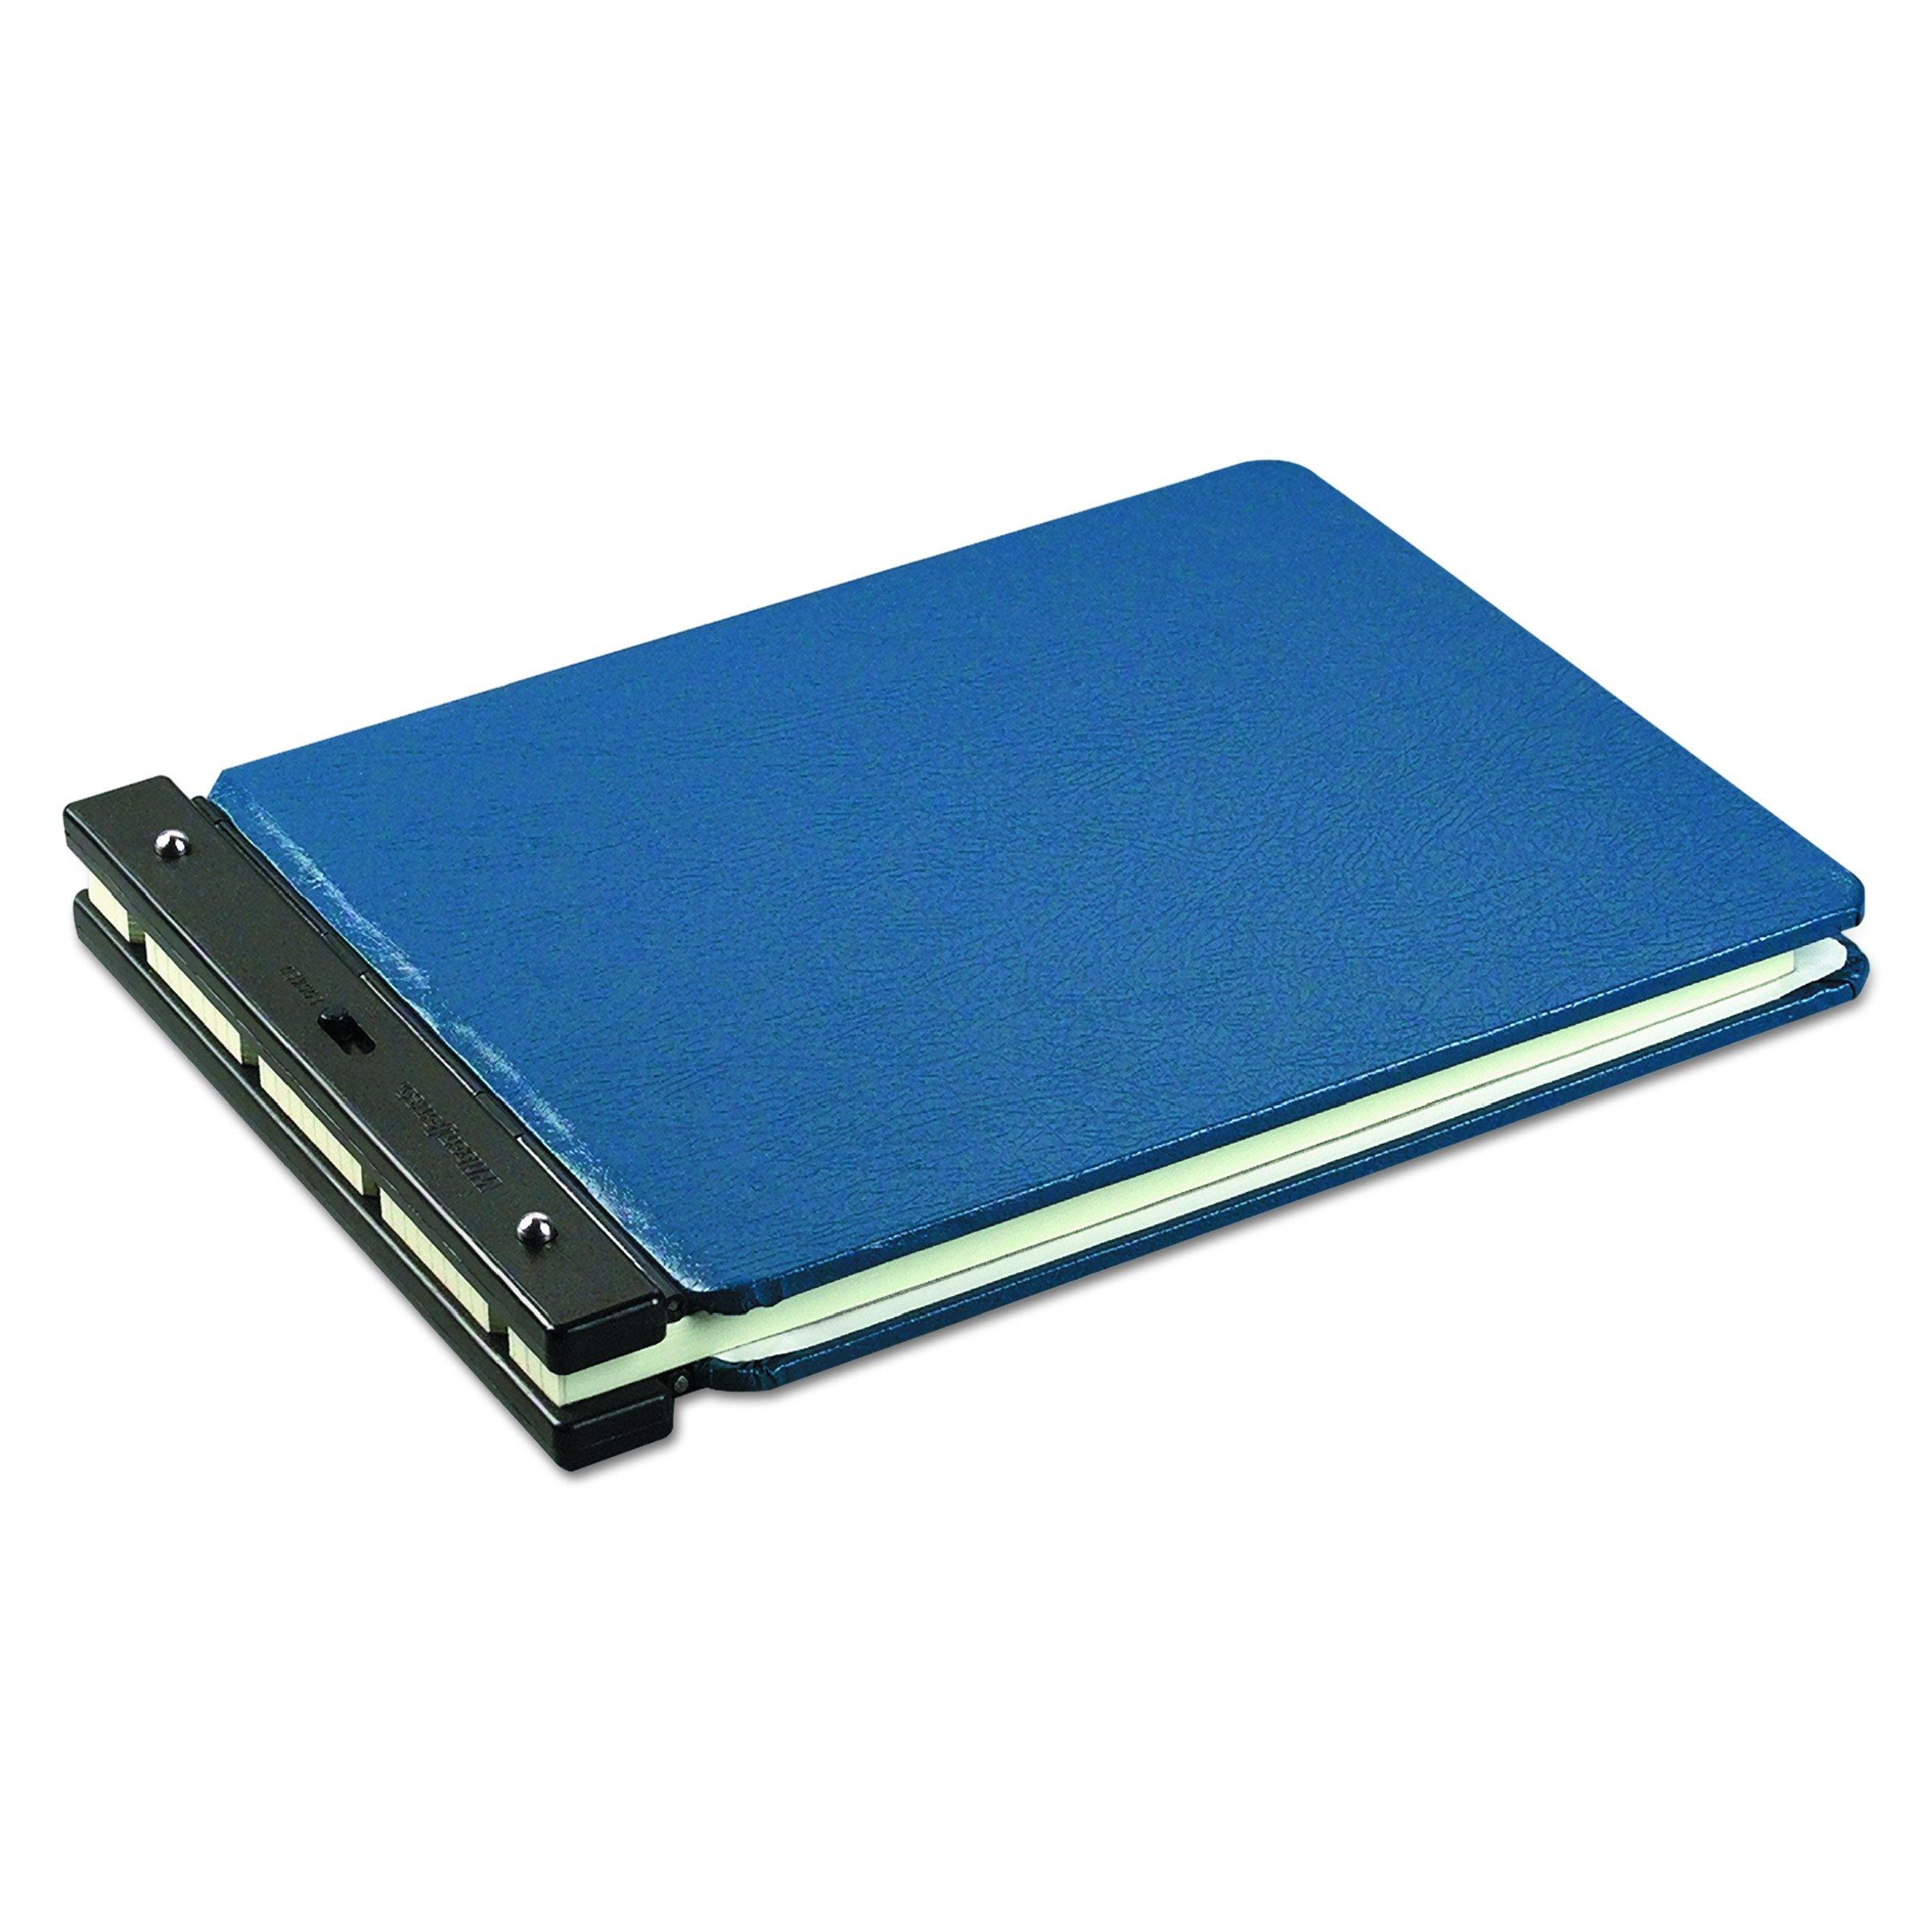 Wilson Jones Nomad Vinyl-Guarded Post Binder, 11'' x 17'', 8-1/4'' Post to Post, Light Blue, W226-65NA by Wilson Jones